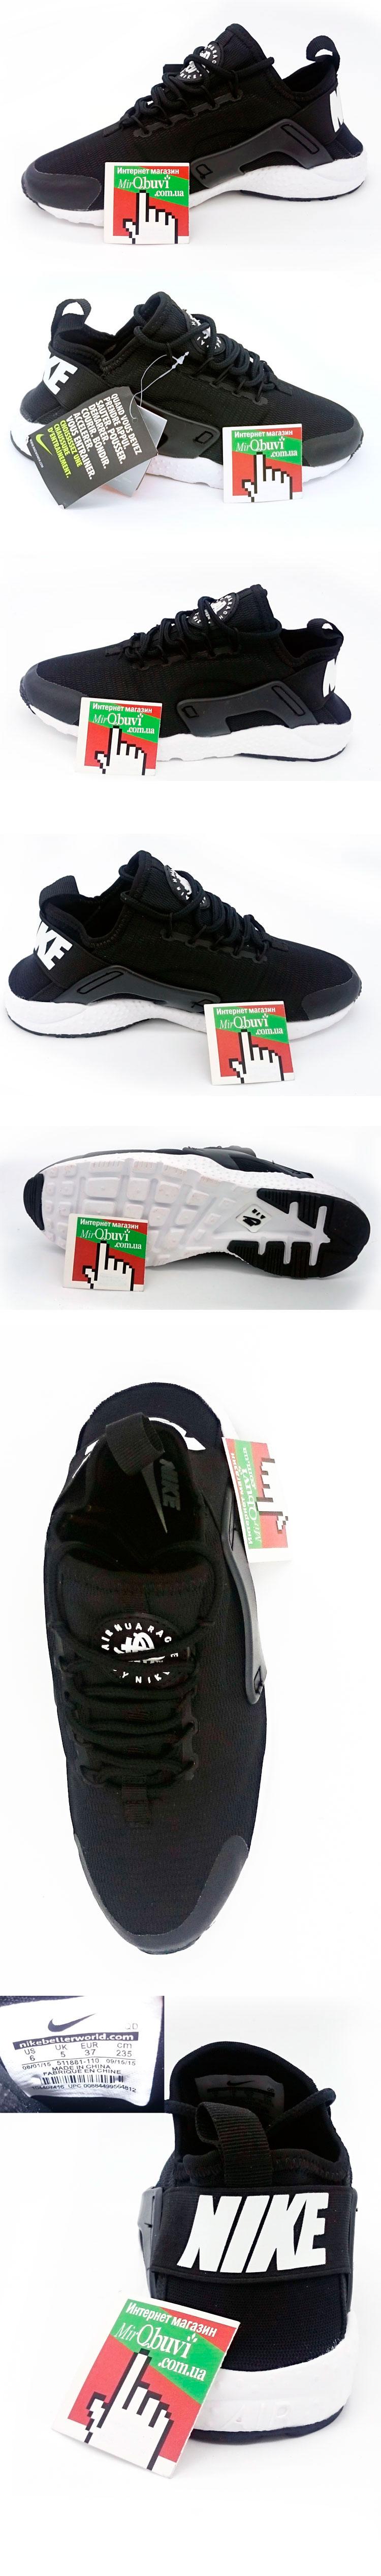 большое фото №5 Nike Huarache ultra черно-белые